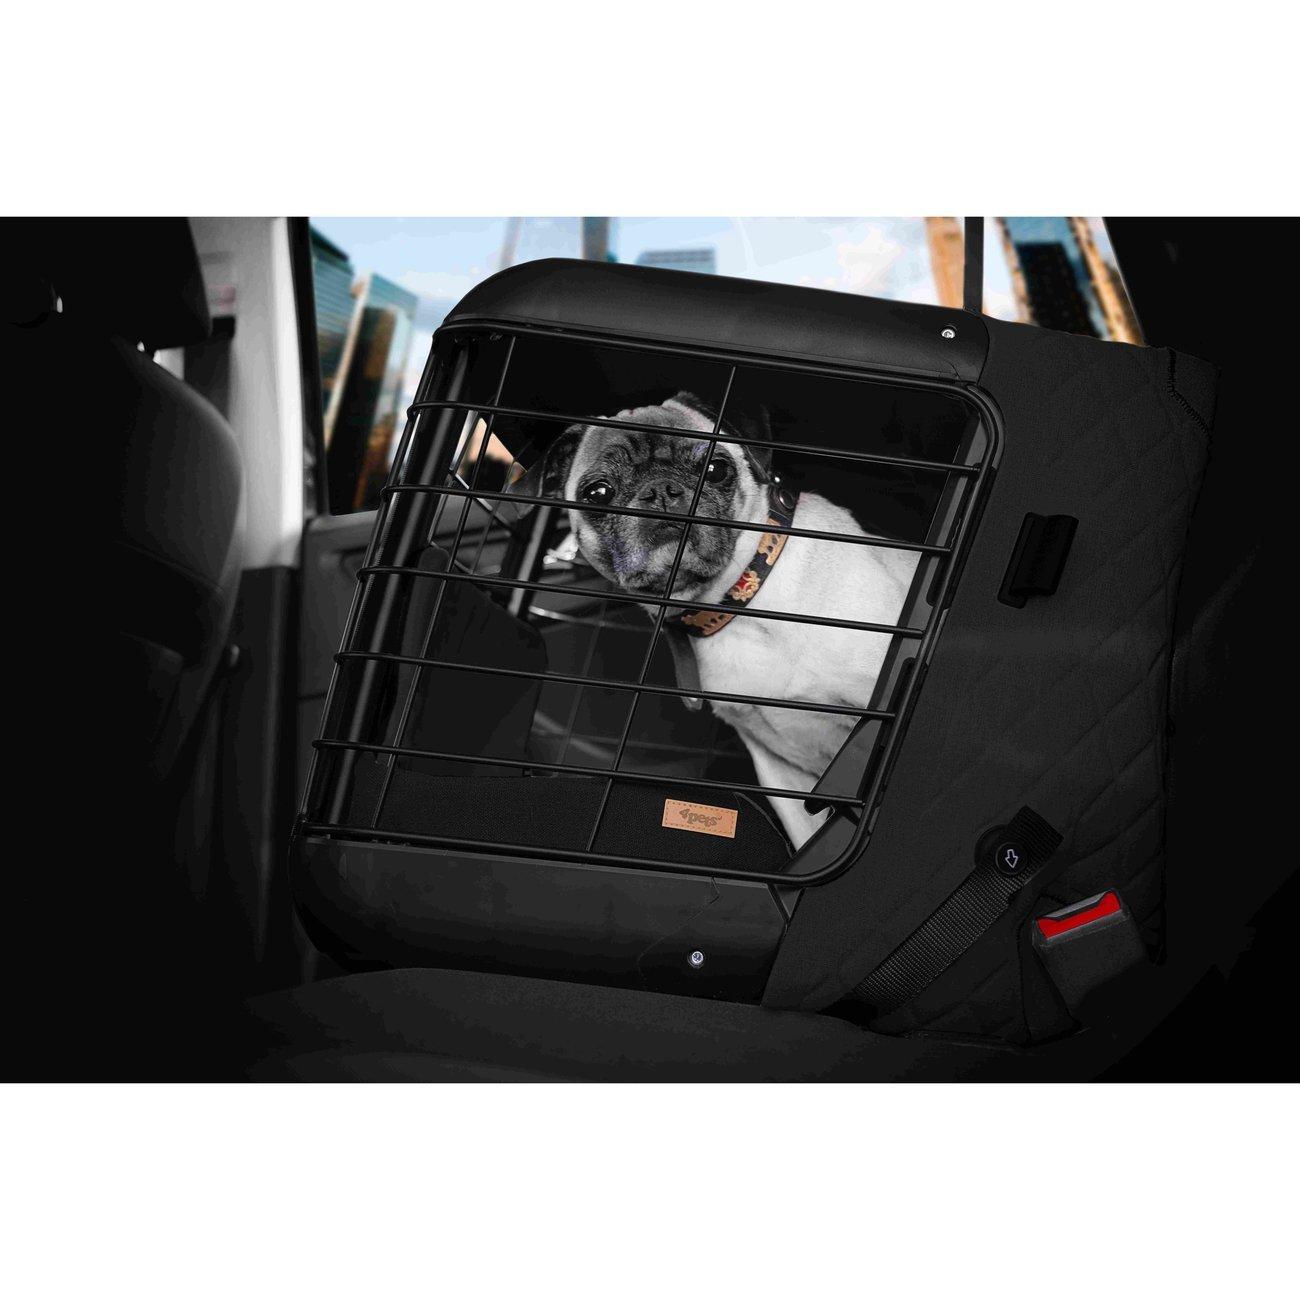 4pets Dog Caree Hundebox Transportbox für Hunde, Bild 12